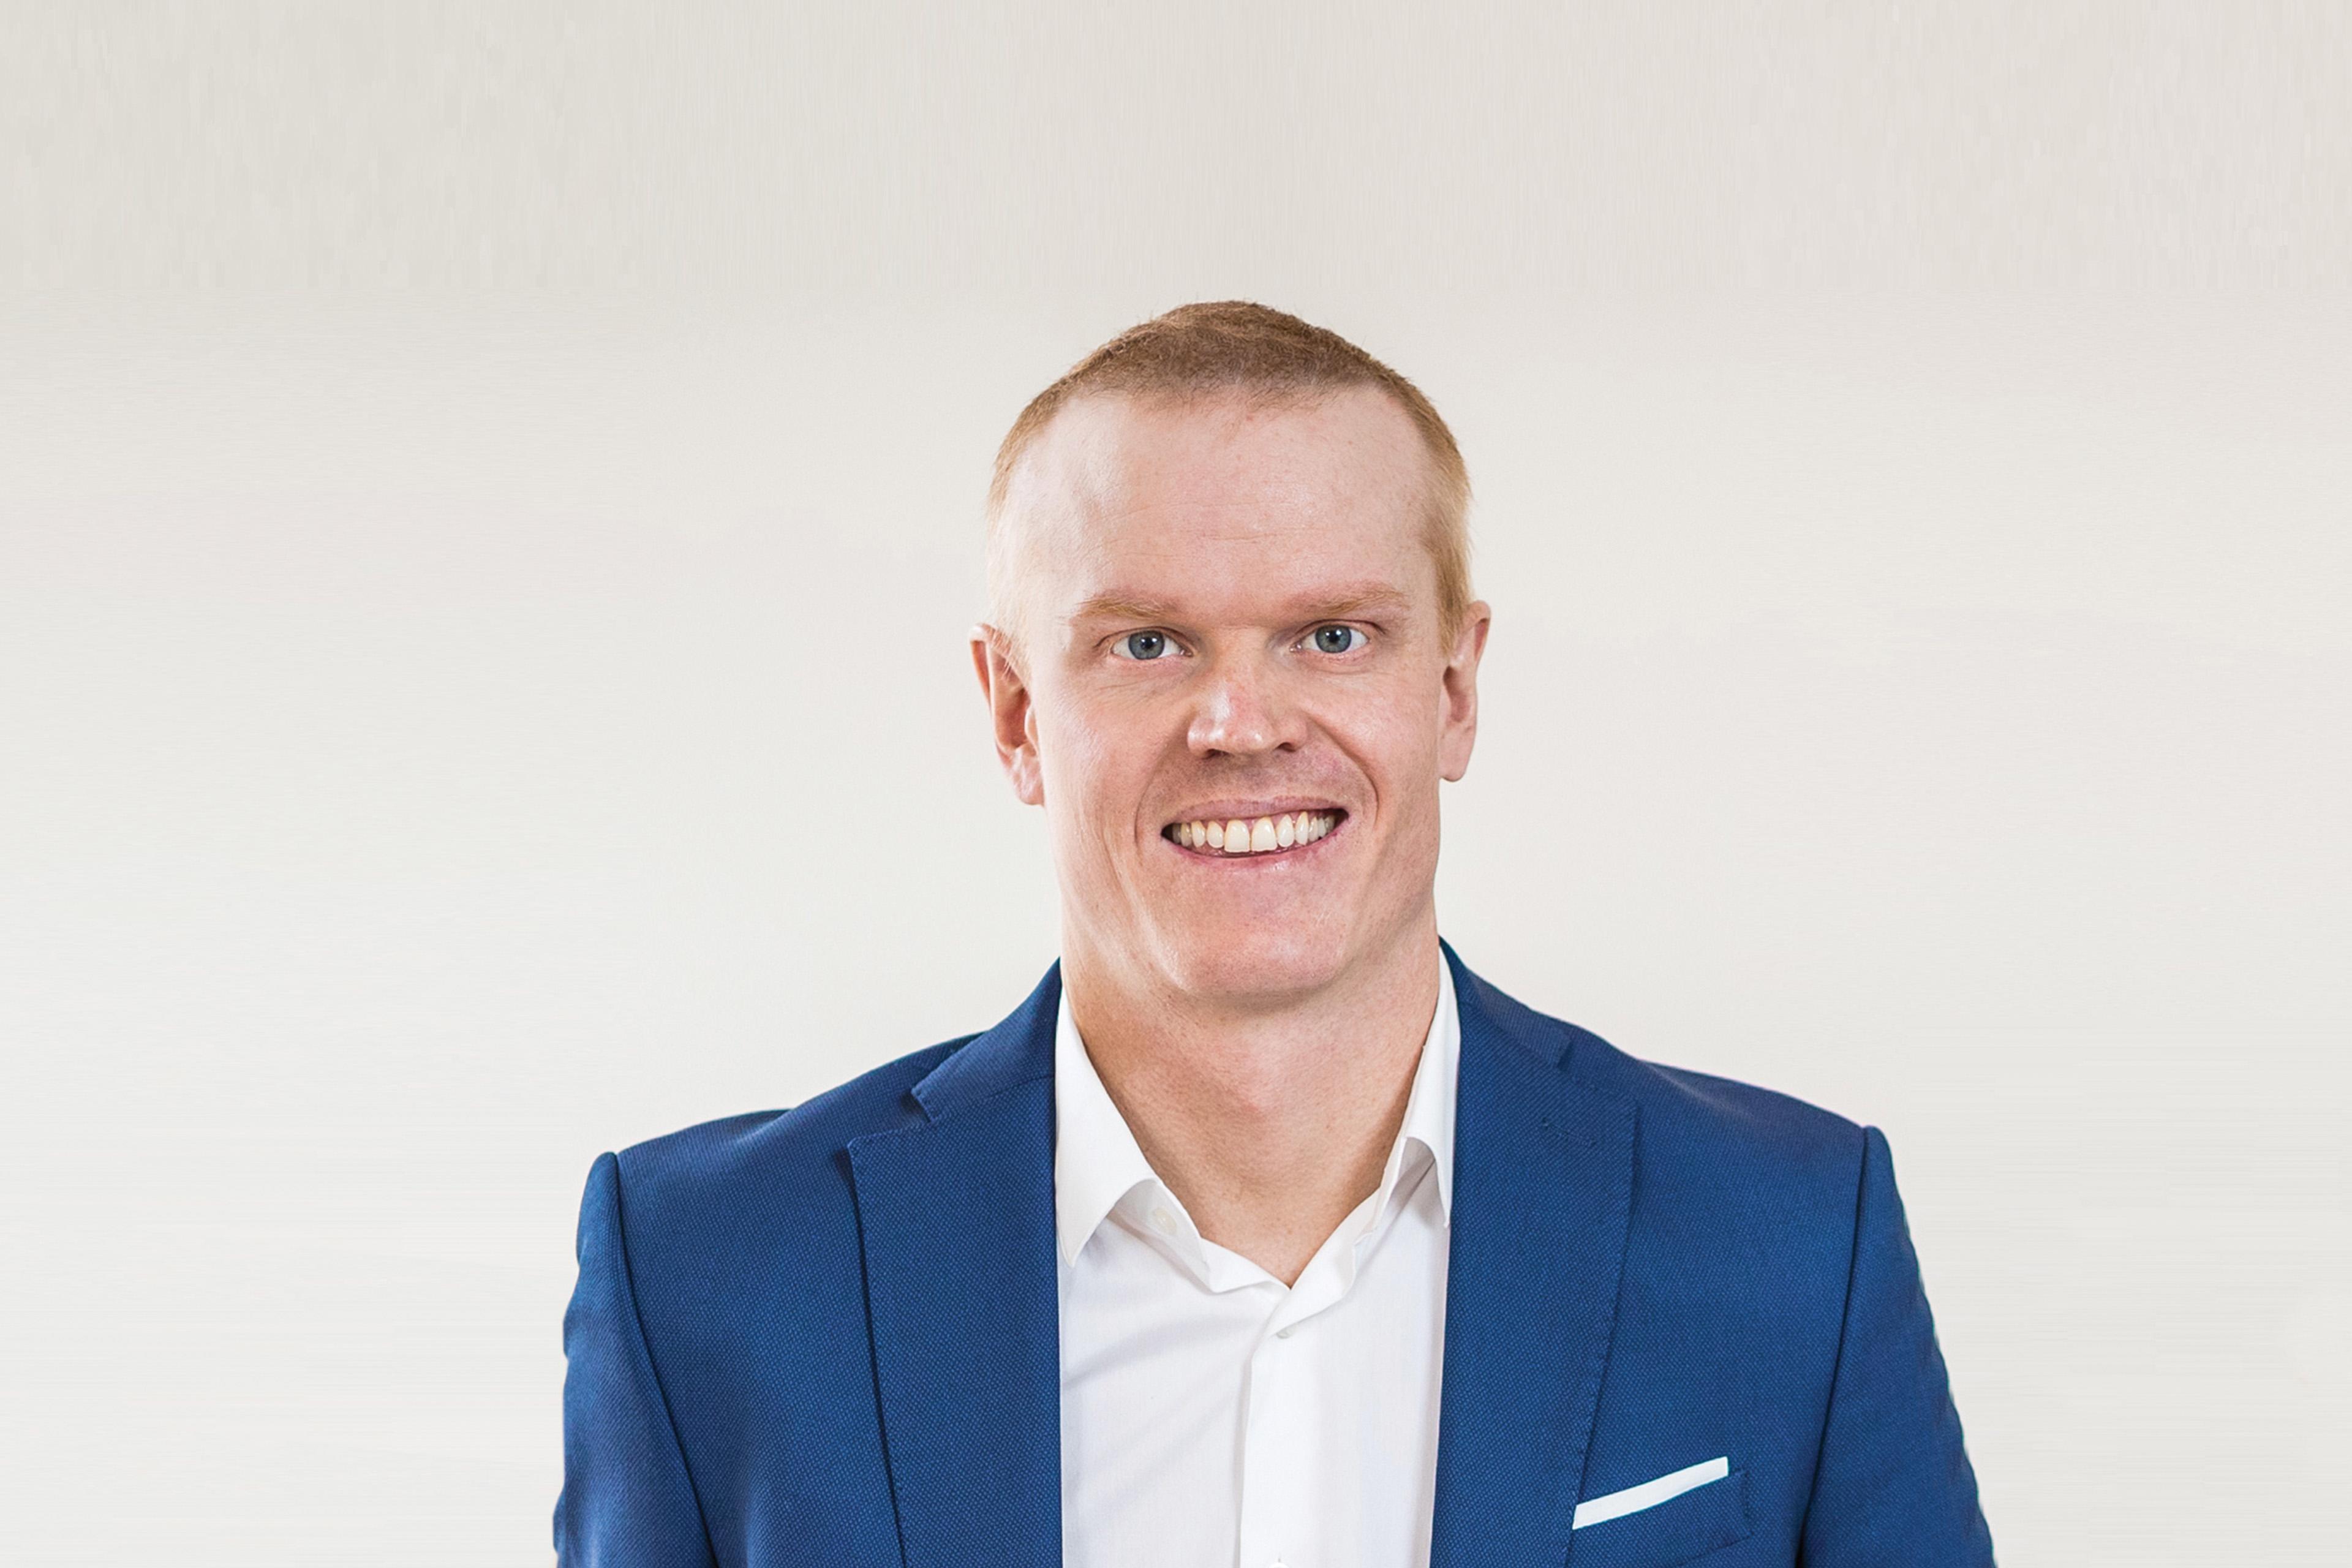 2019 Entrepreneur Nick Mowbray